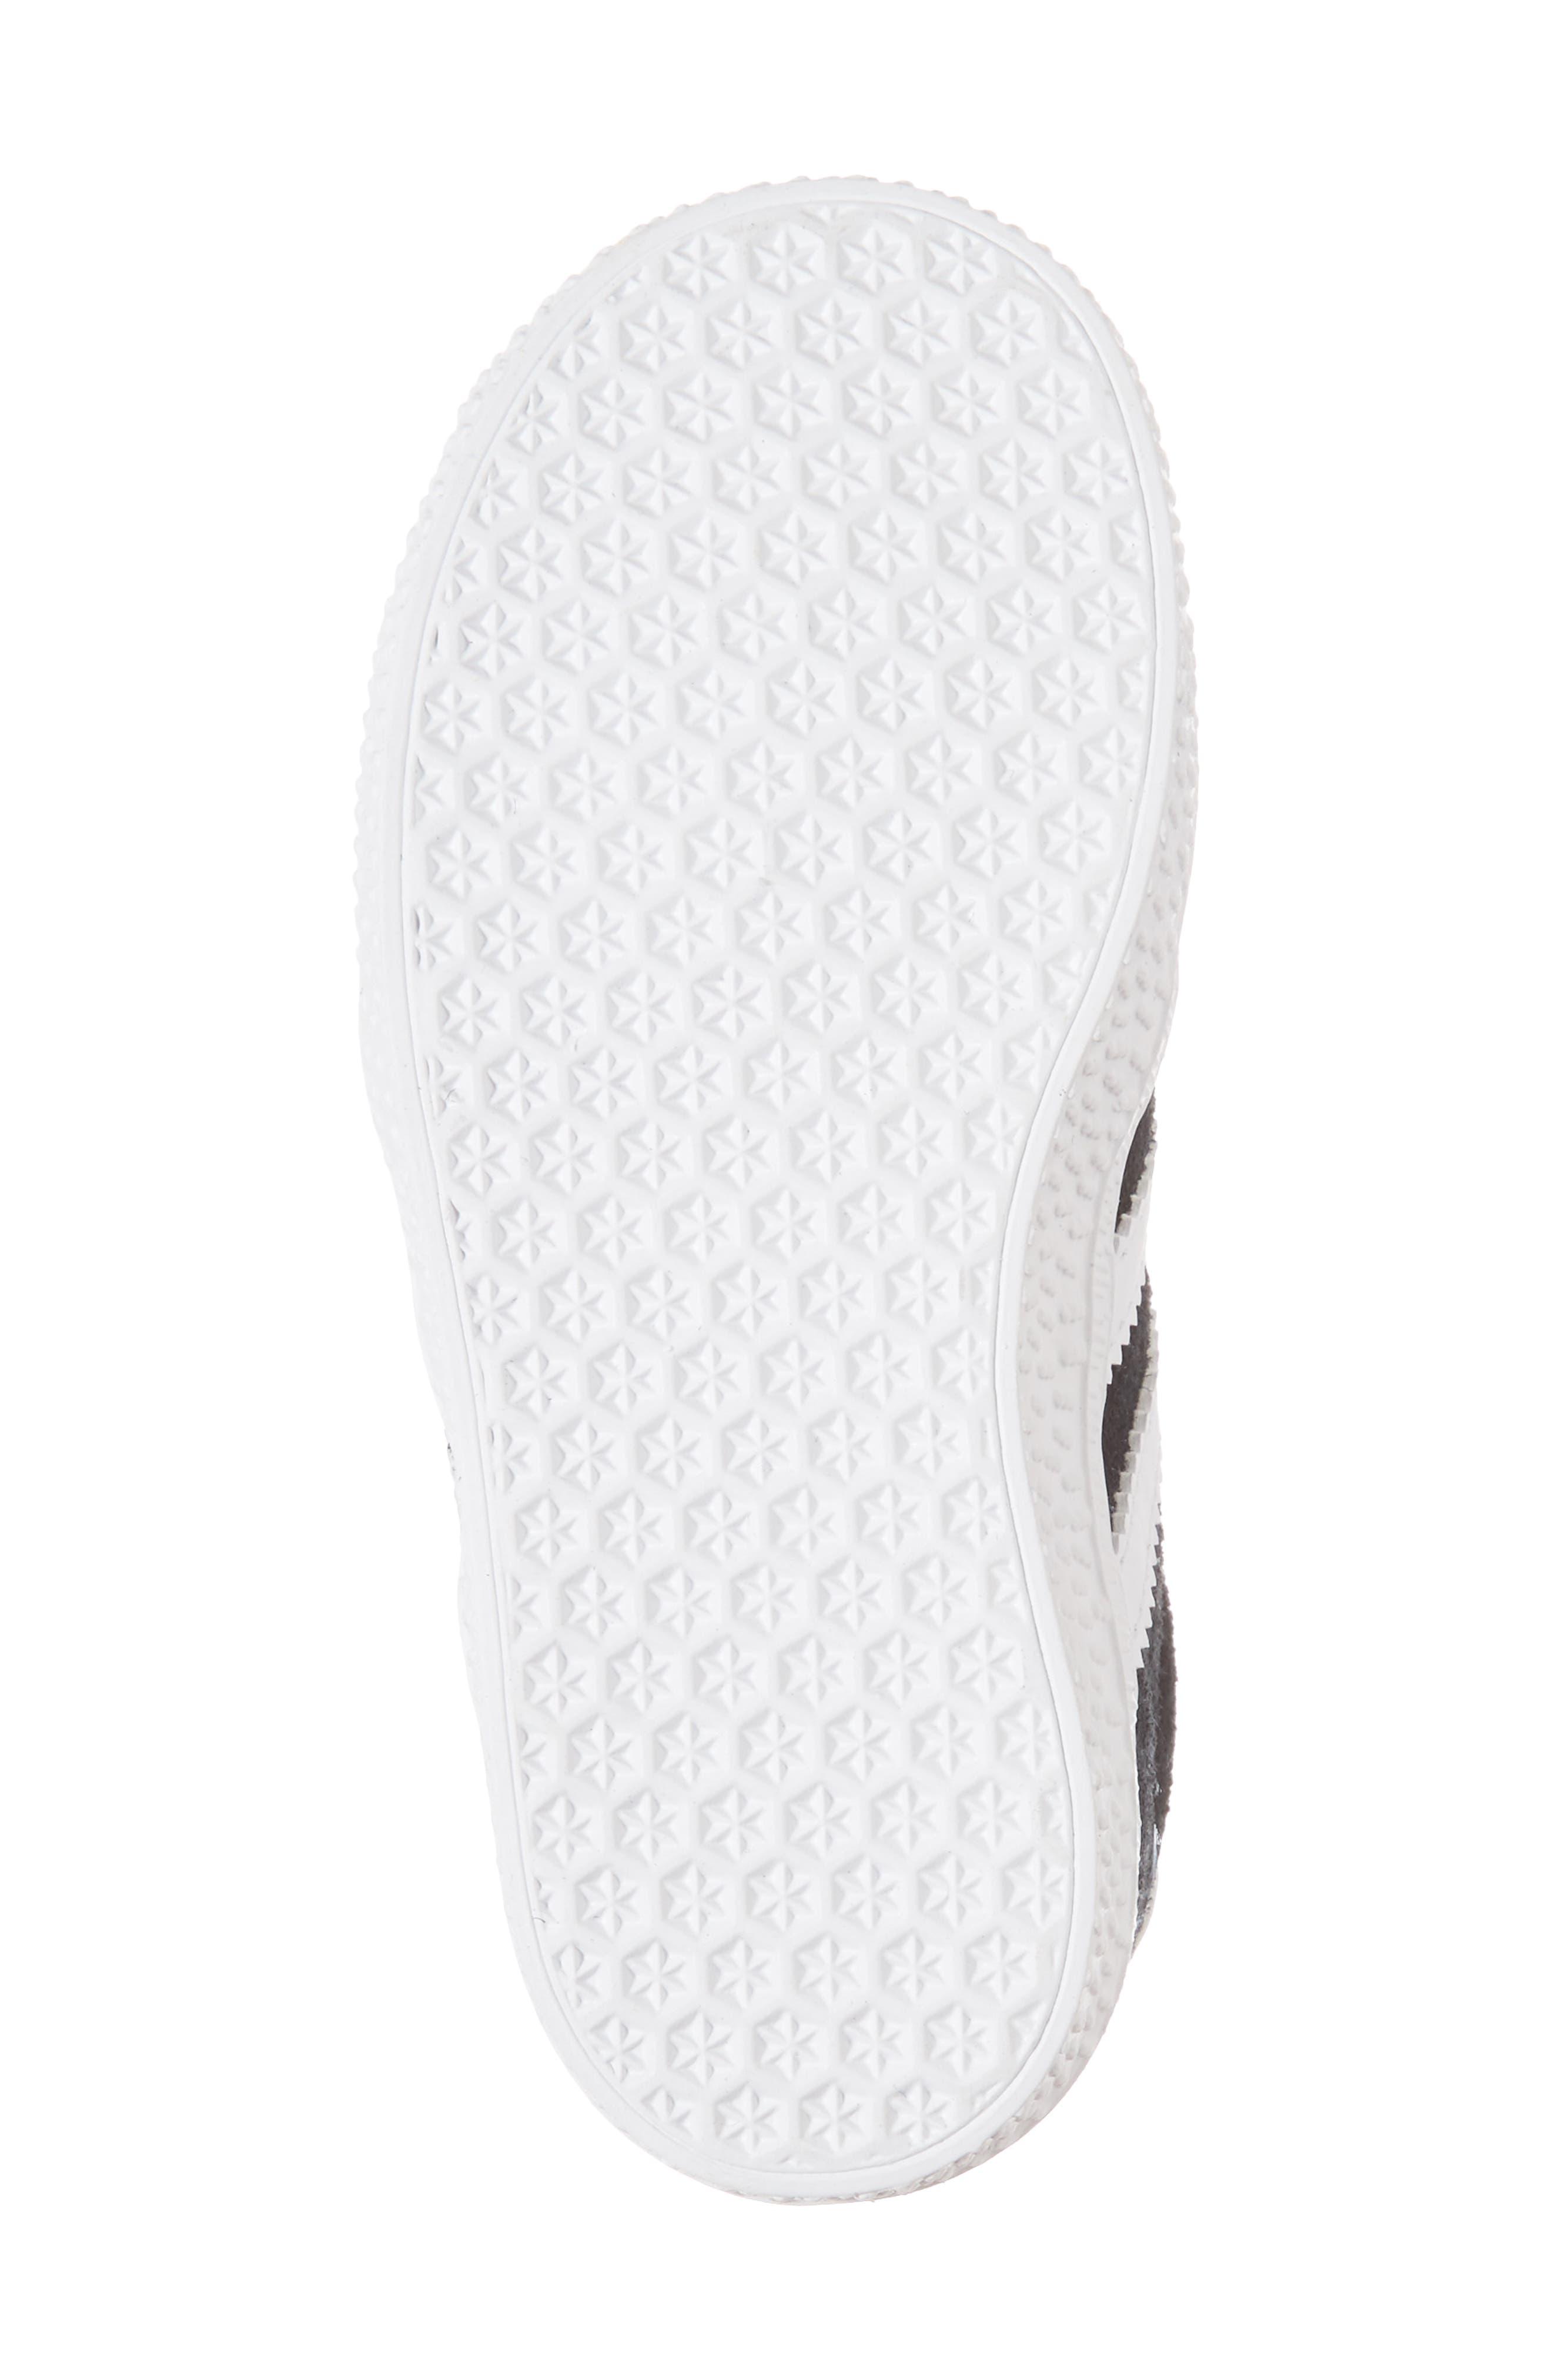 Gazelle Sneaker,                             Alternate thumbnail 7, color,                             Core Black / White / White